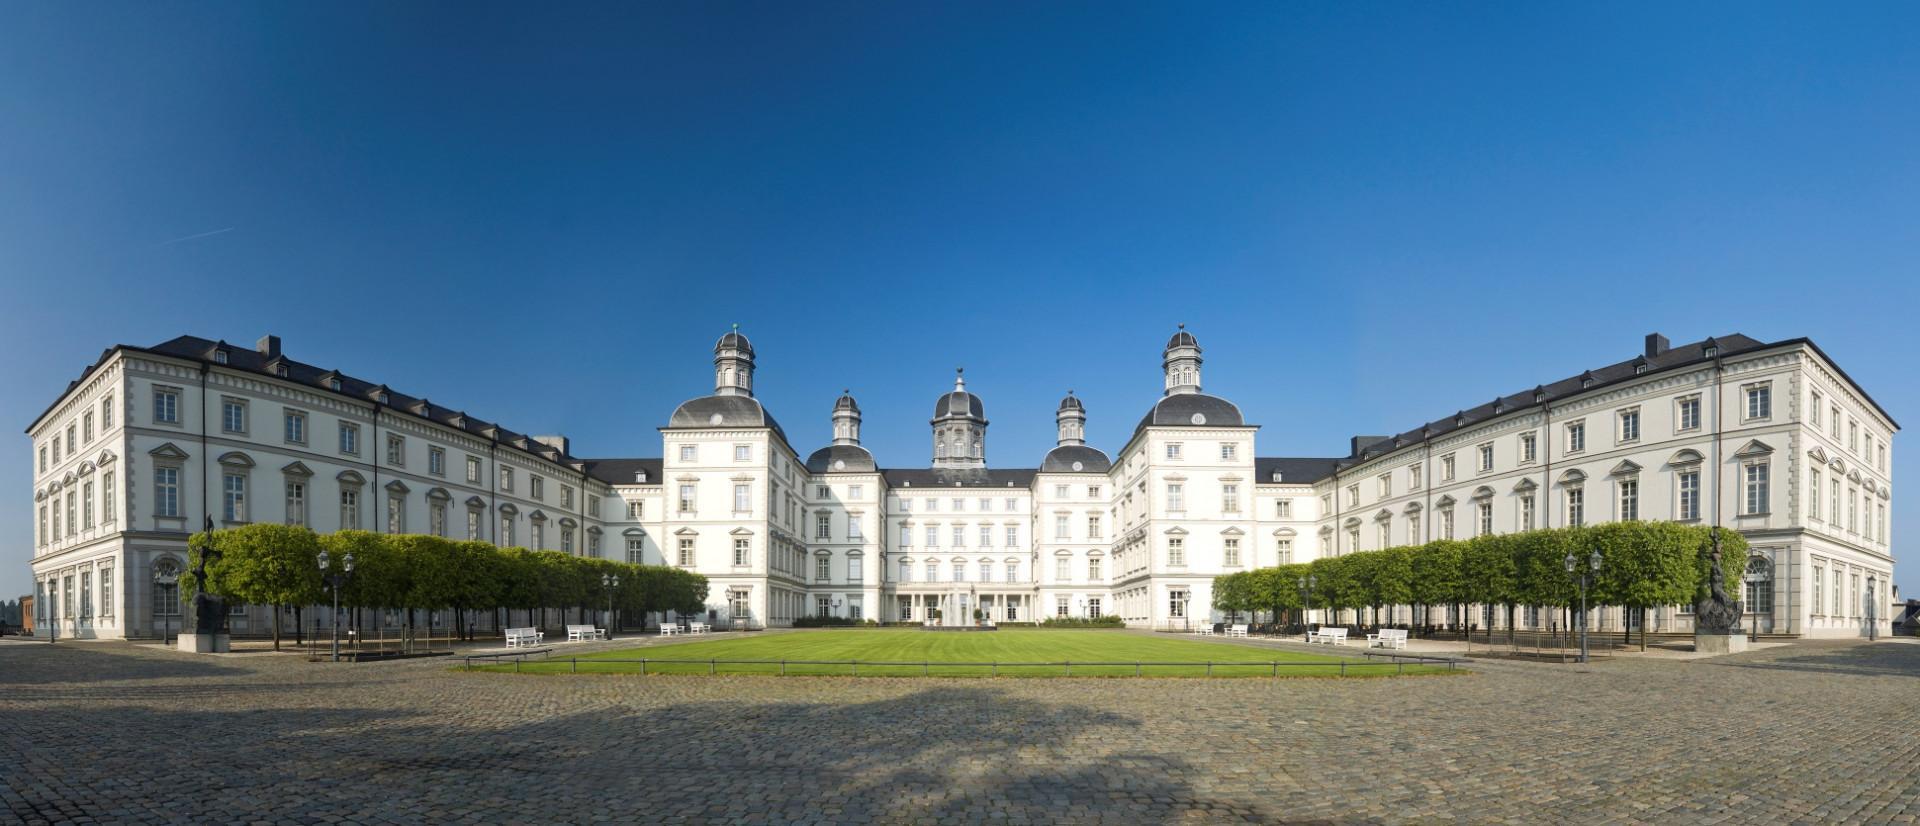 Grandhotel Schloss Bensberg - Panorama klein